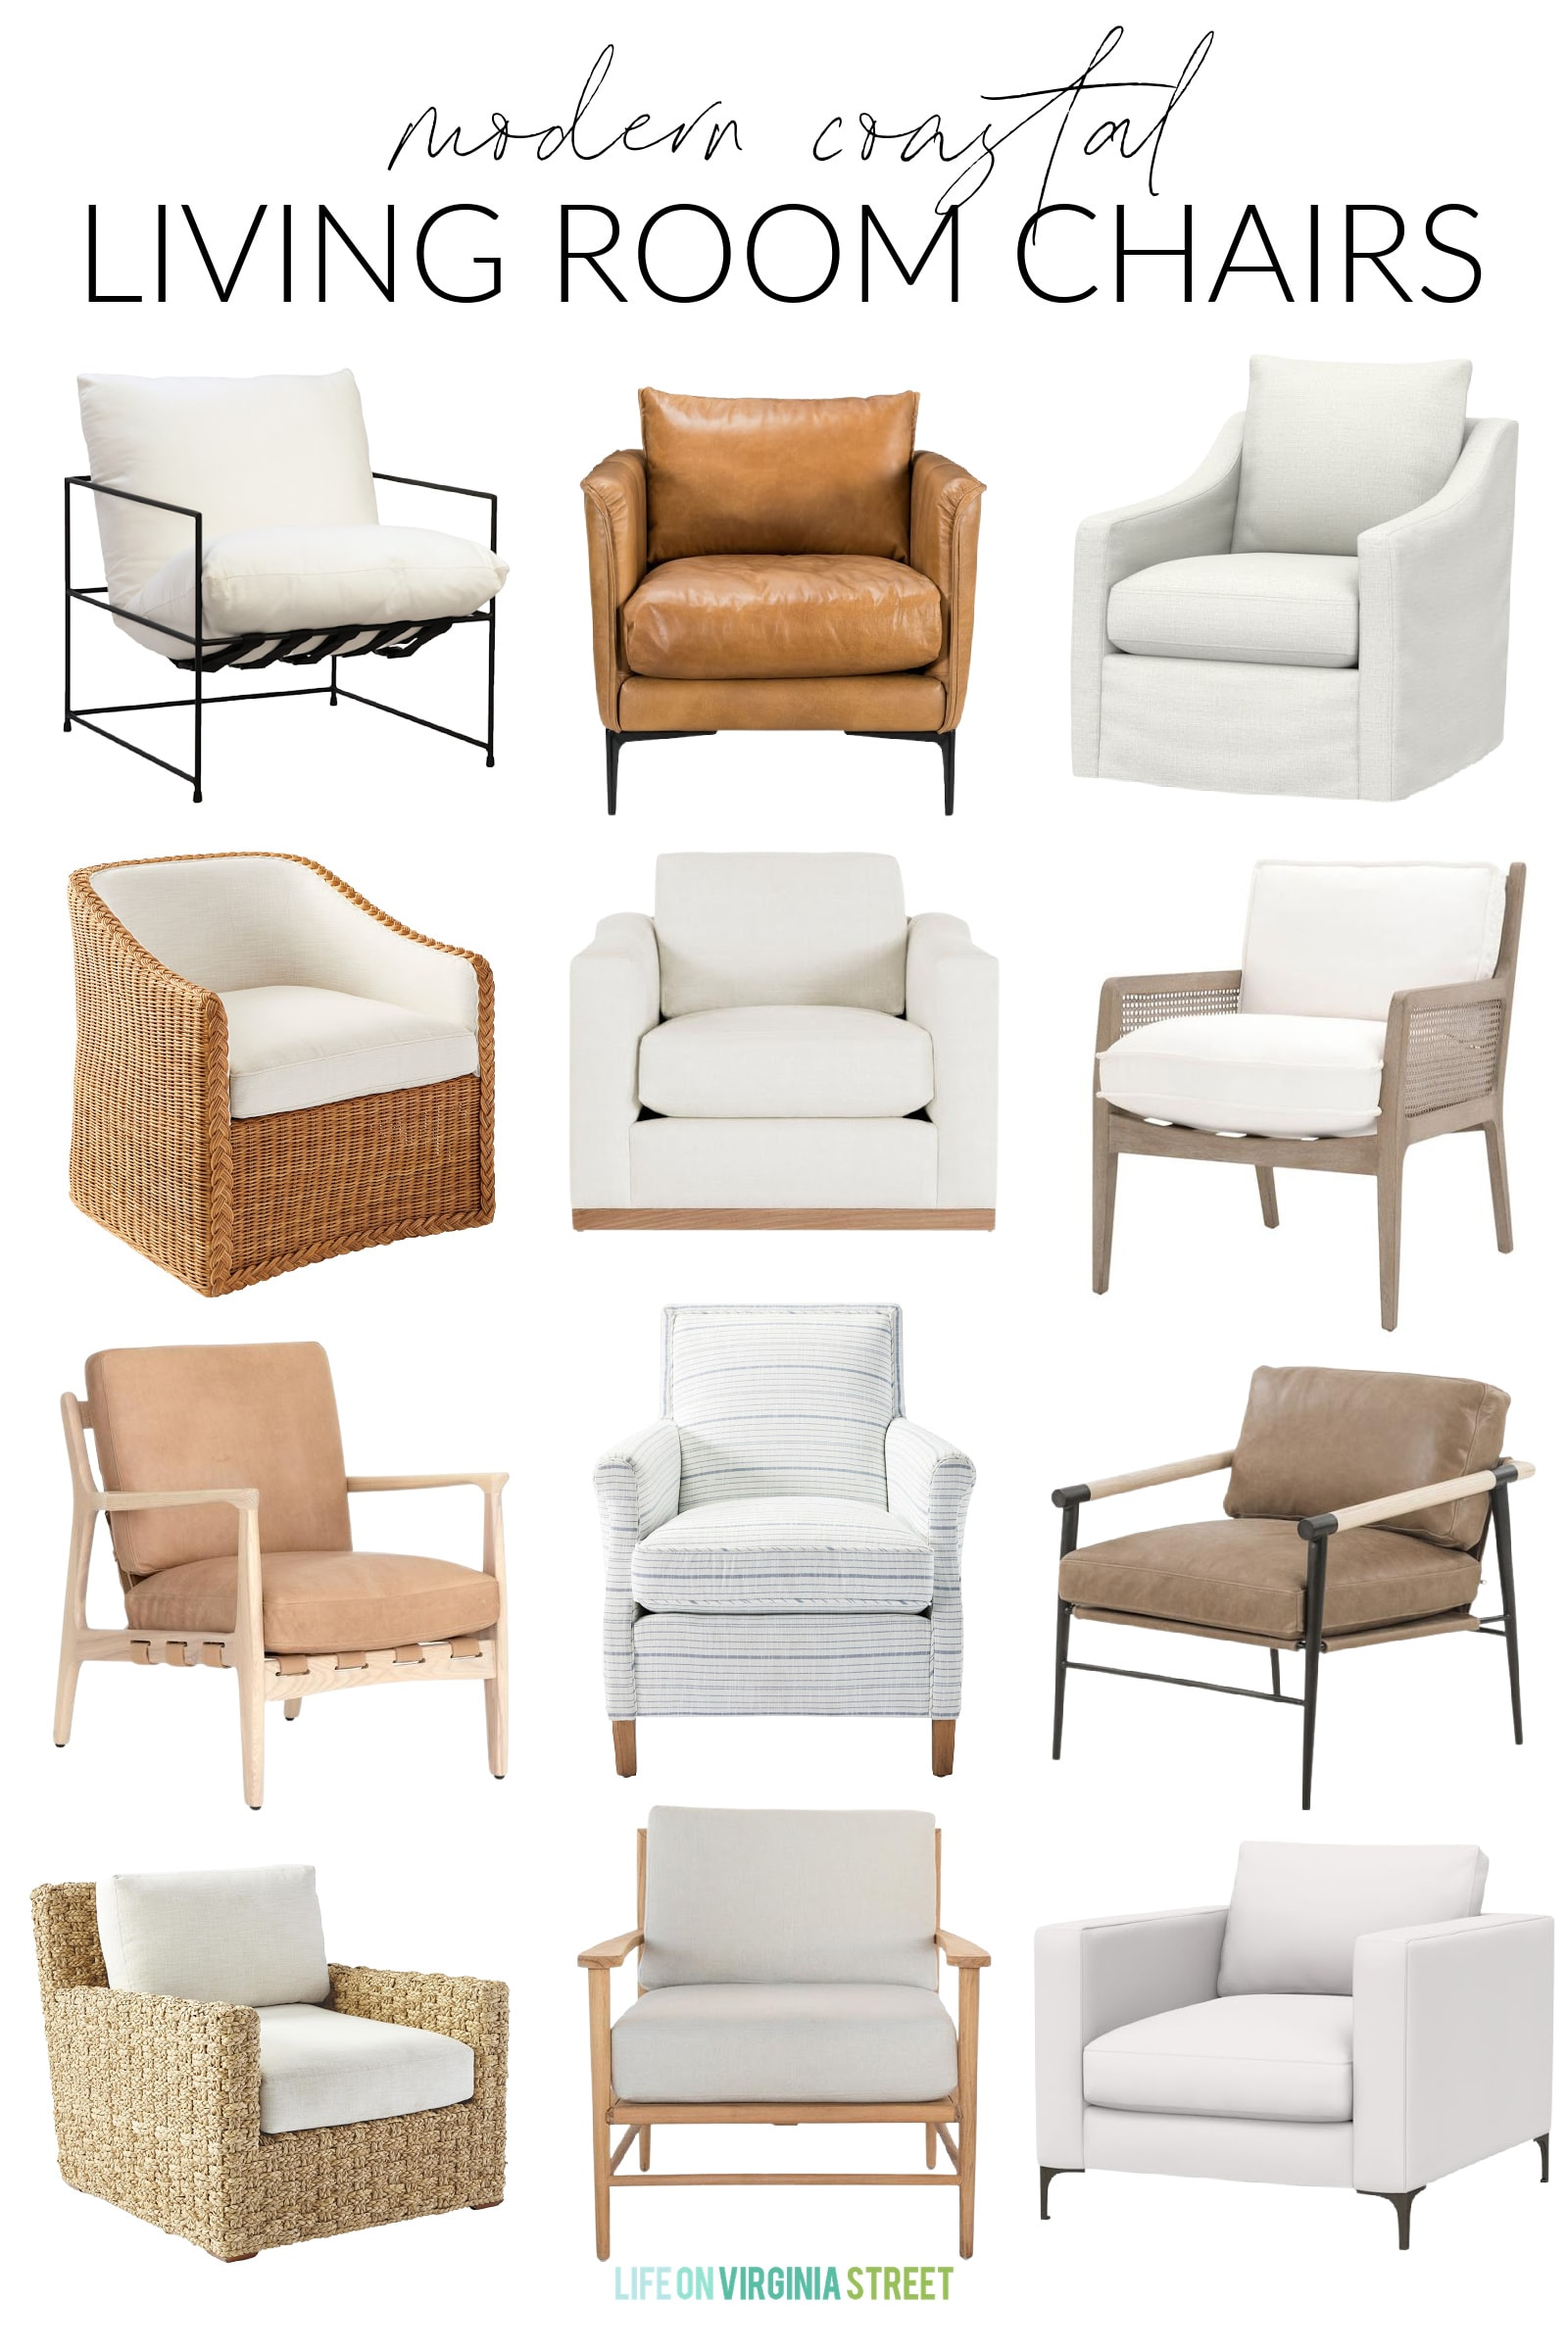 Modern Coastal Living Room Chairs, Modern Living Room Chairs